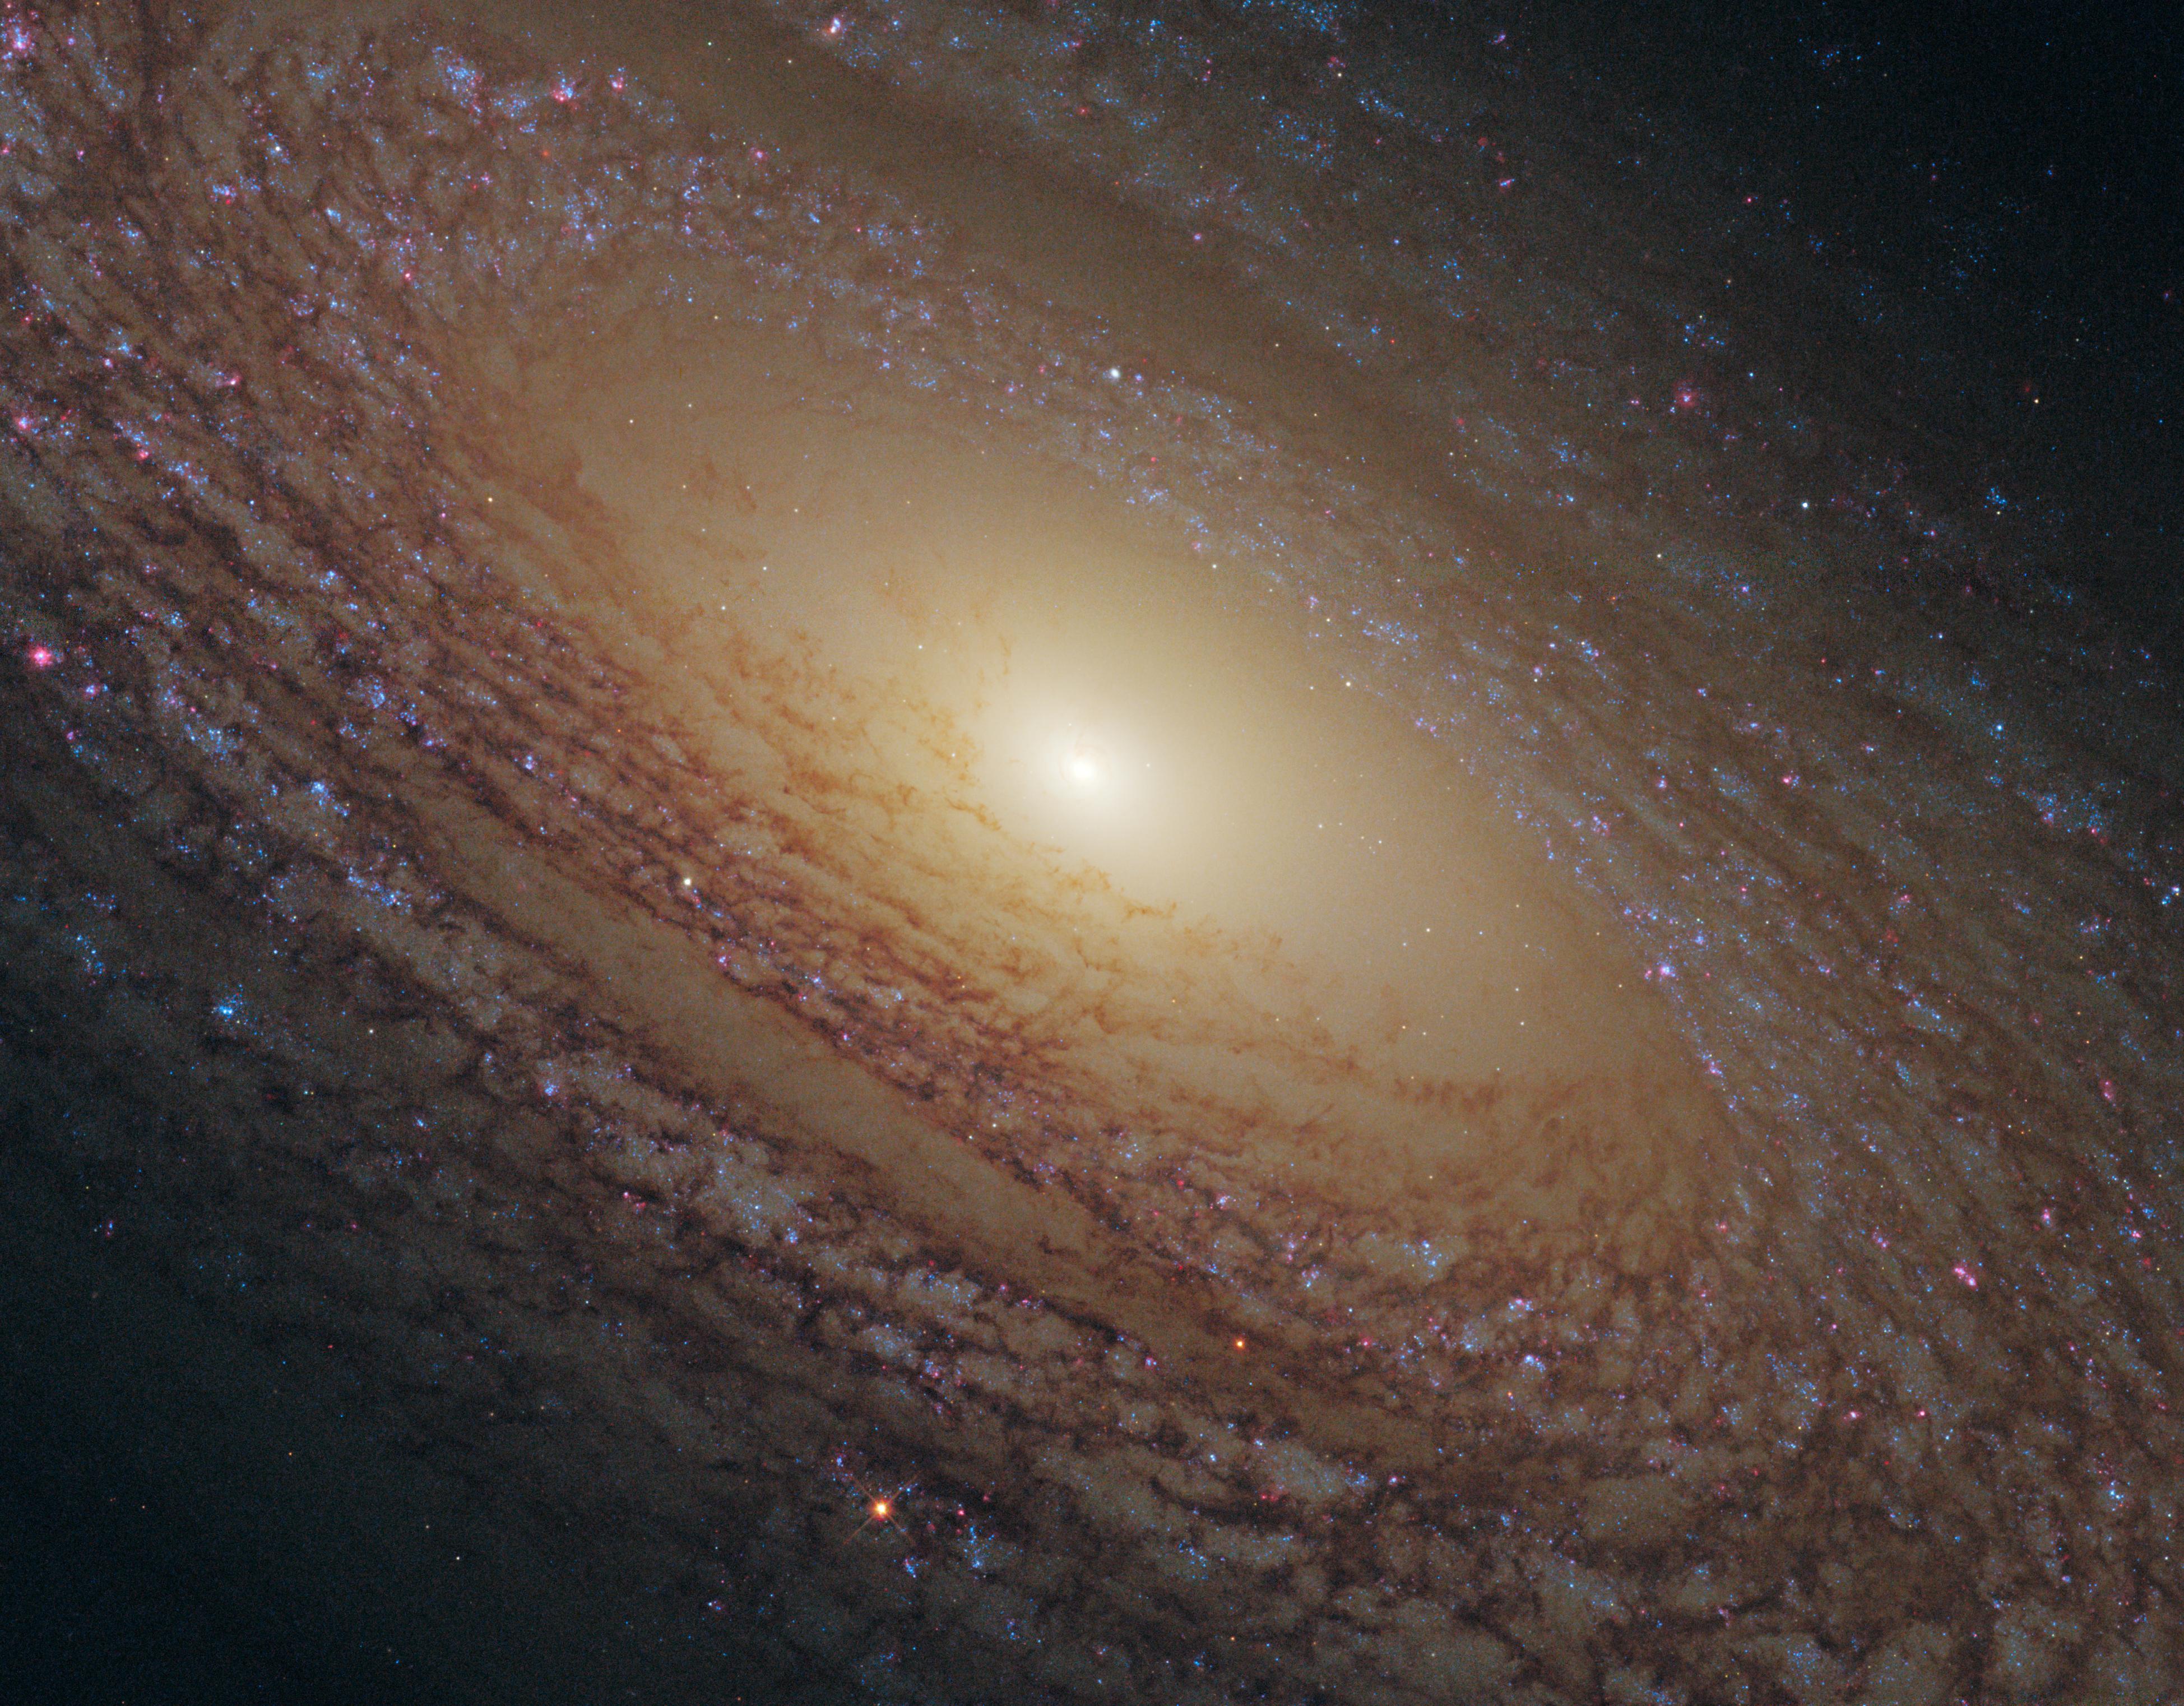 HUBBLE'S TOP 100 • #27 • Credit: NASA, ESA and the Hubble Heritage (STScI/AURA)-ESA/Hubble Collaboration